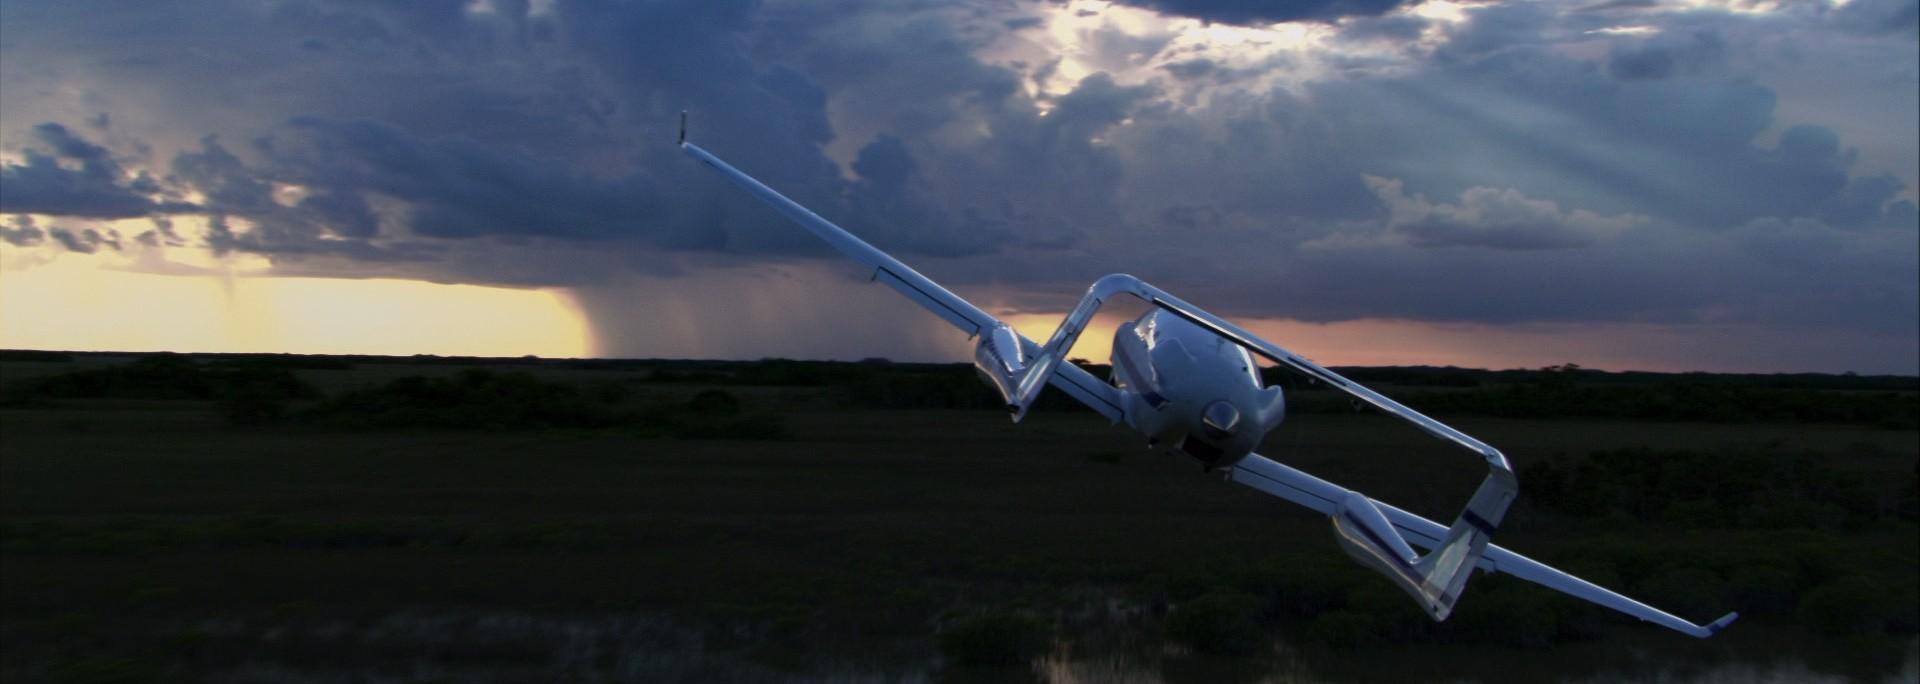 miami-vice-avion.jpg